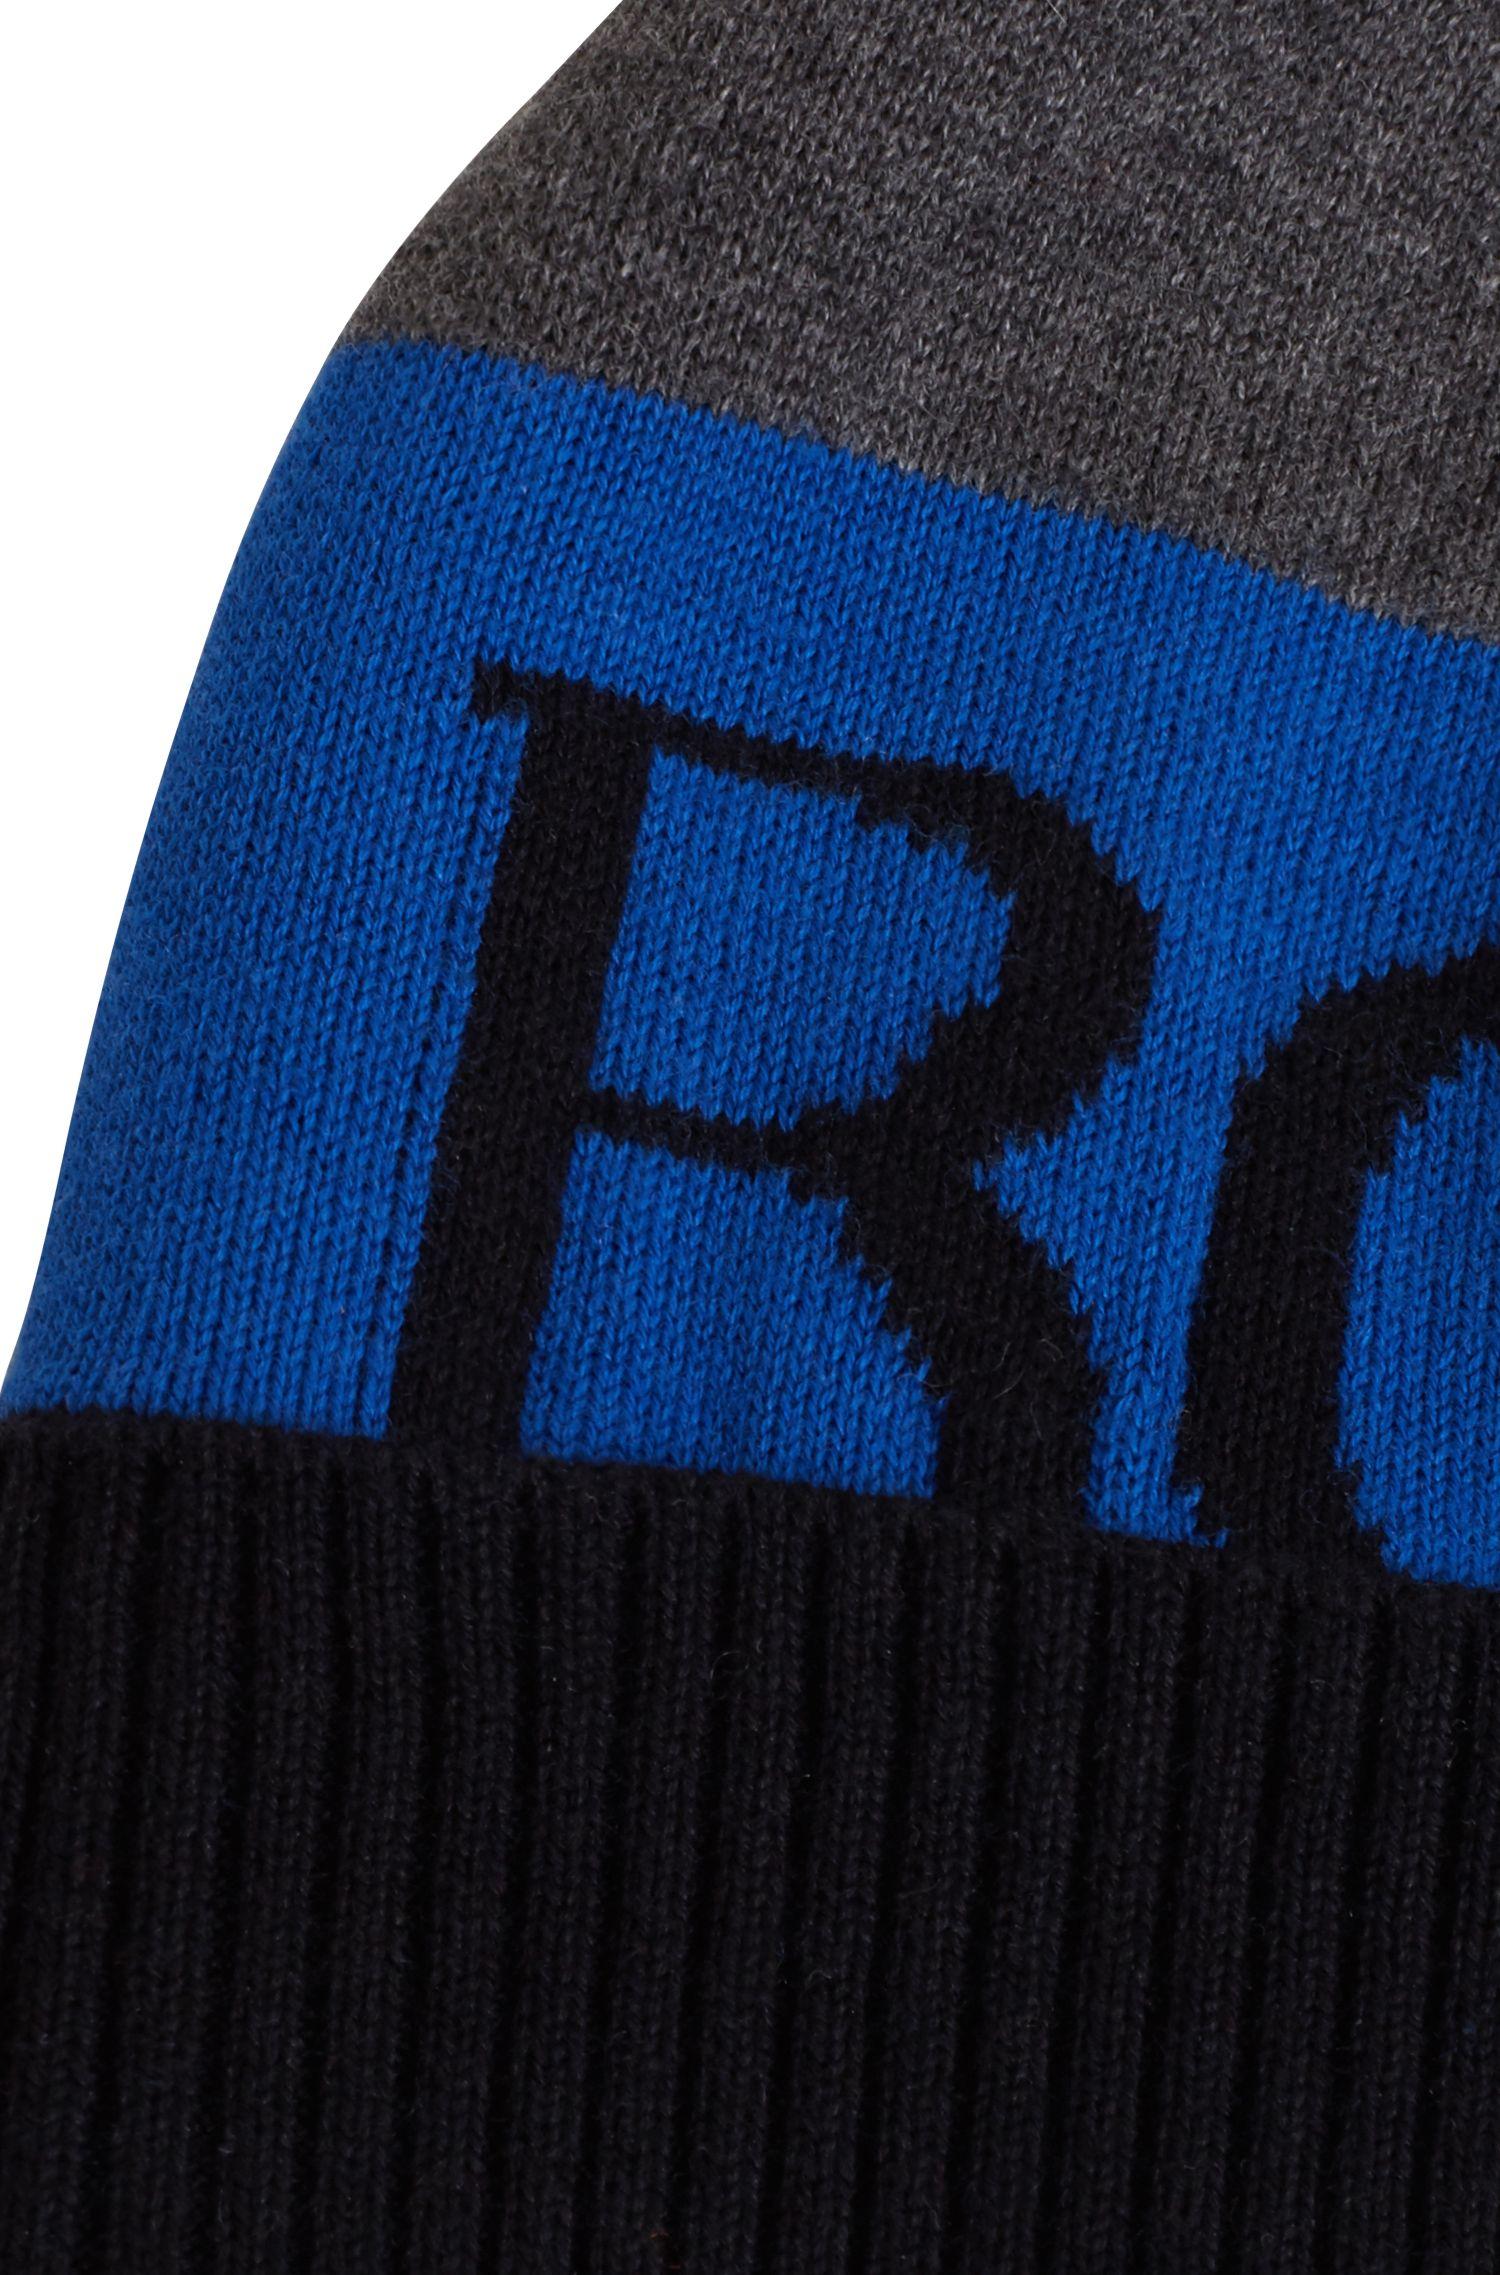 Kindermuts van gekamde katoen met logo in jacquard, Blauw